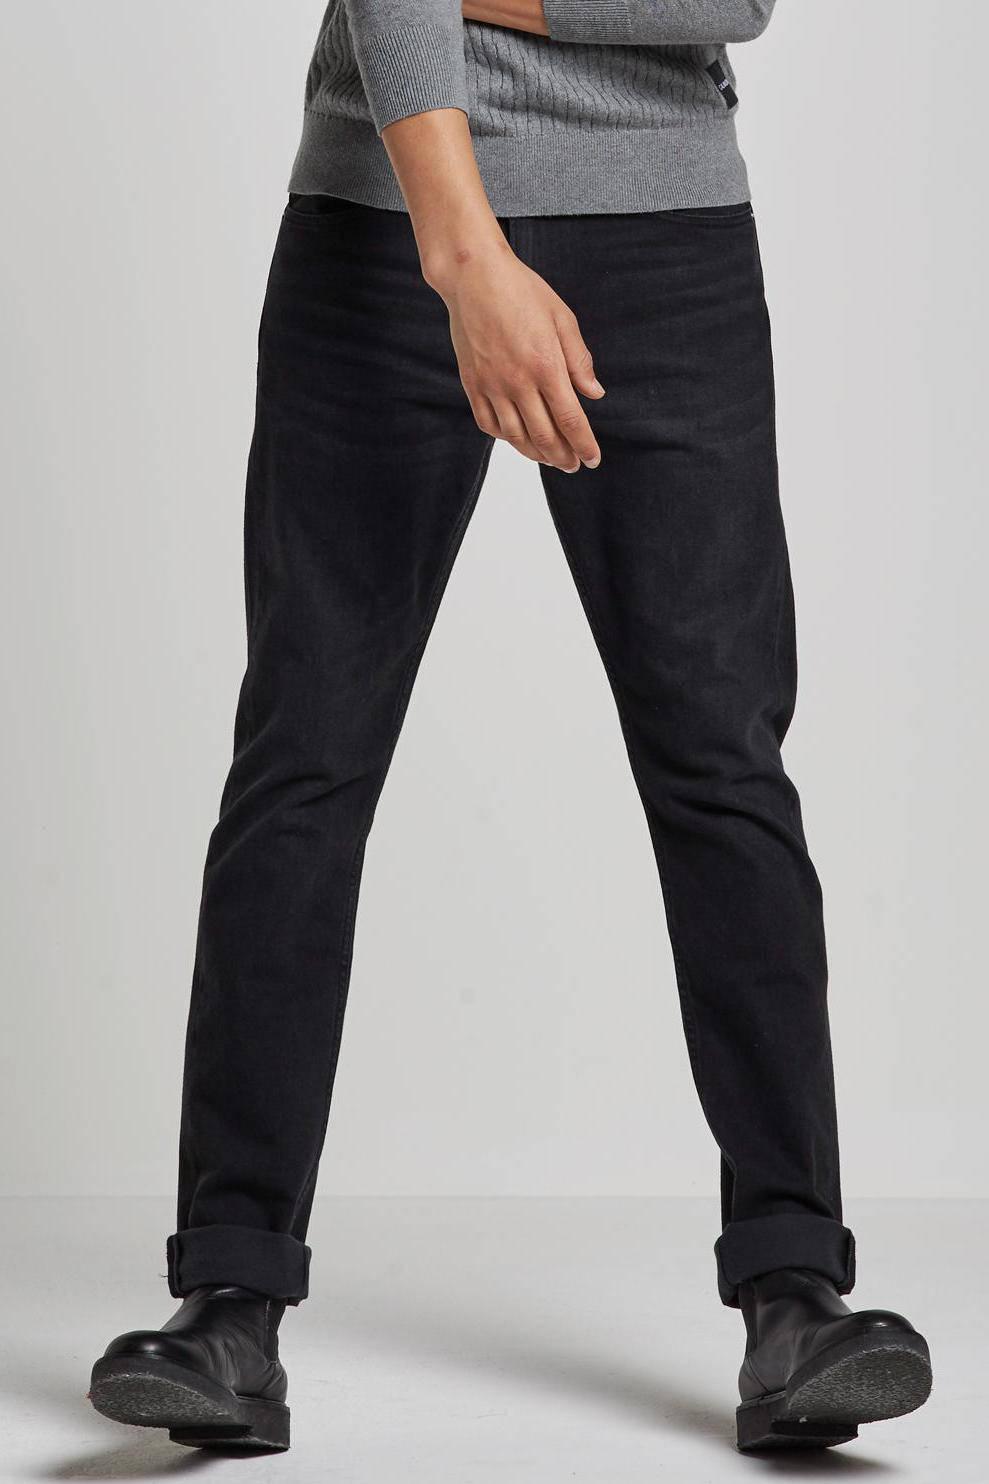 Calvin Klein Jeans 026 SLIM Slim fit jeans copenhagen